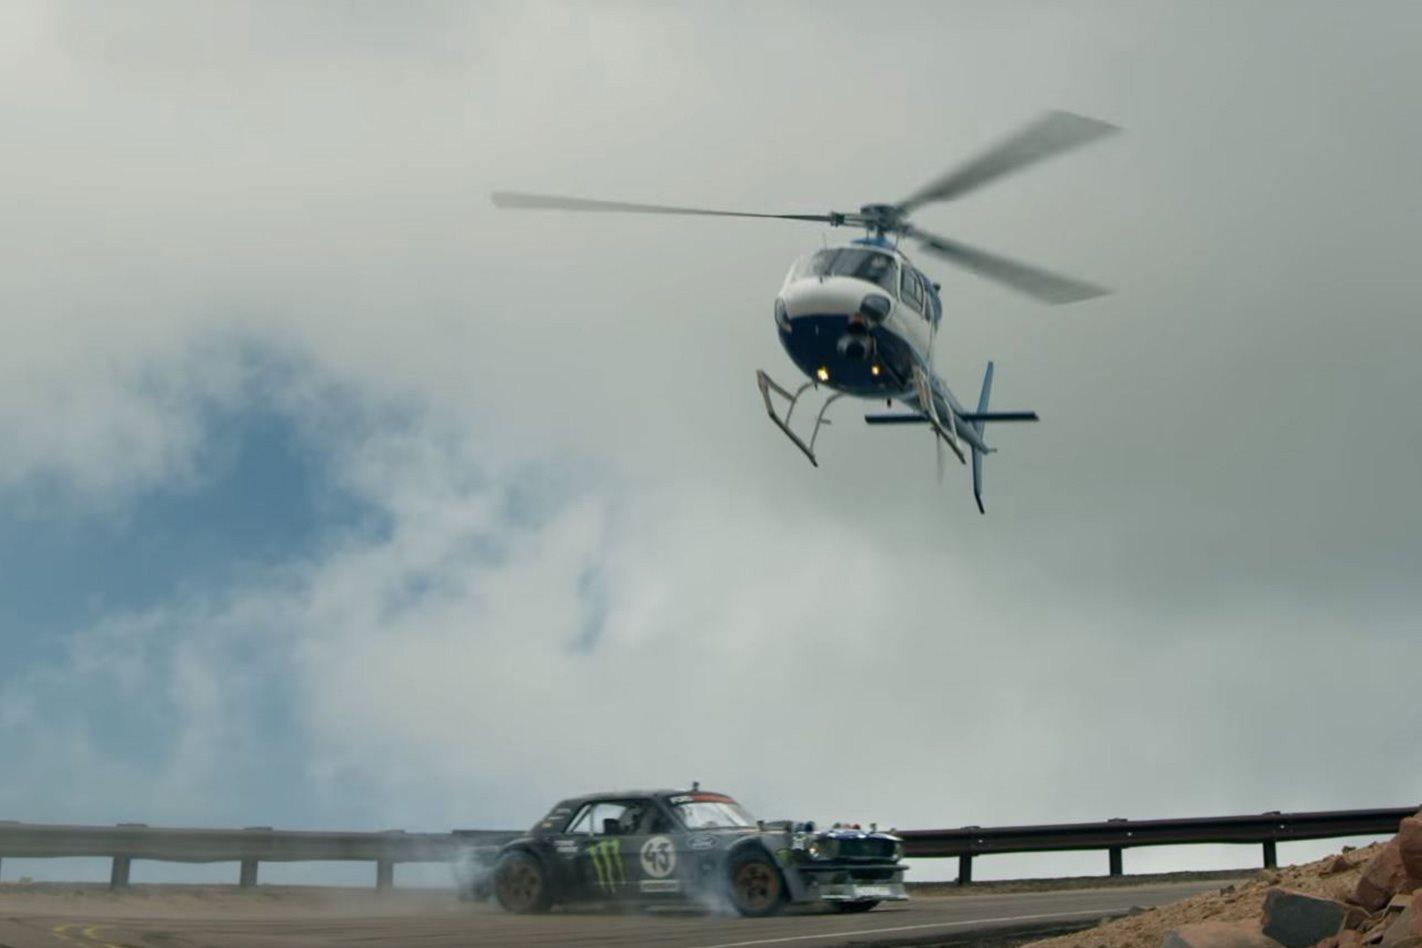 Ken Block's Hoonicorn and helicopter